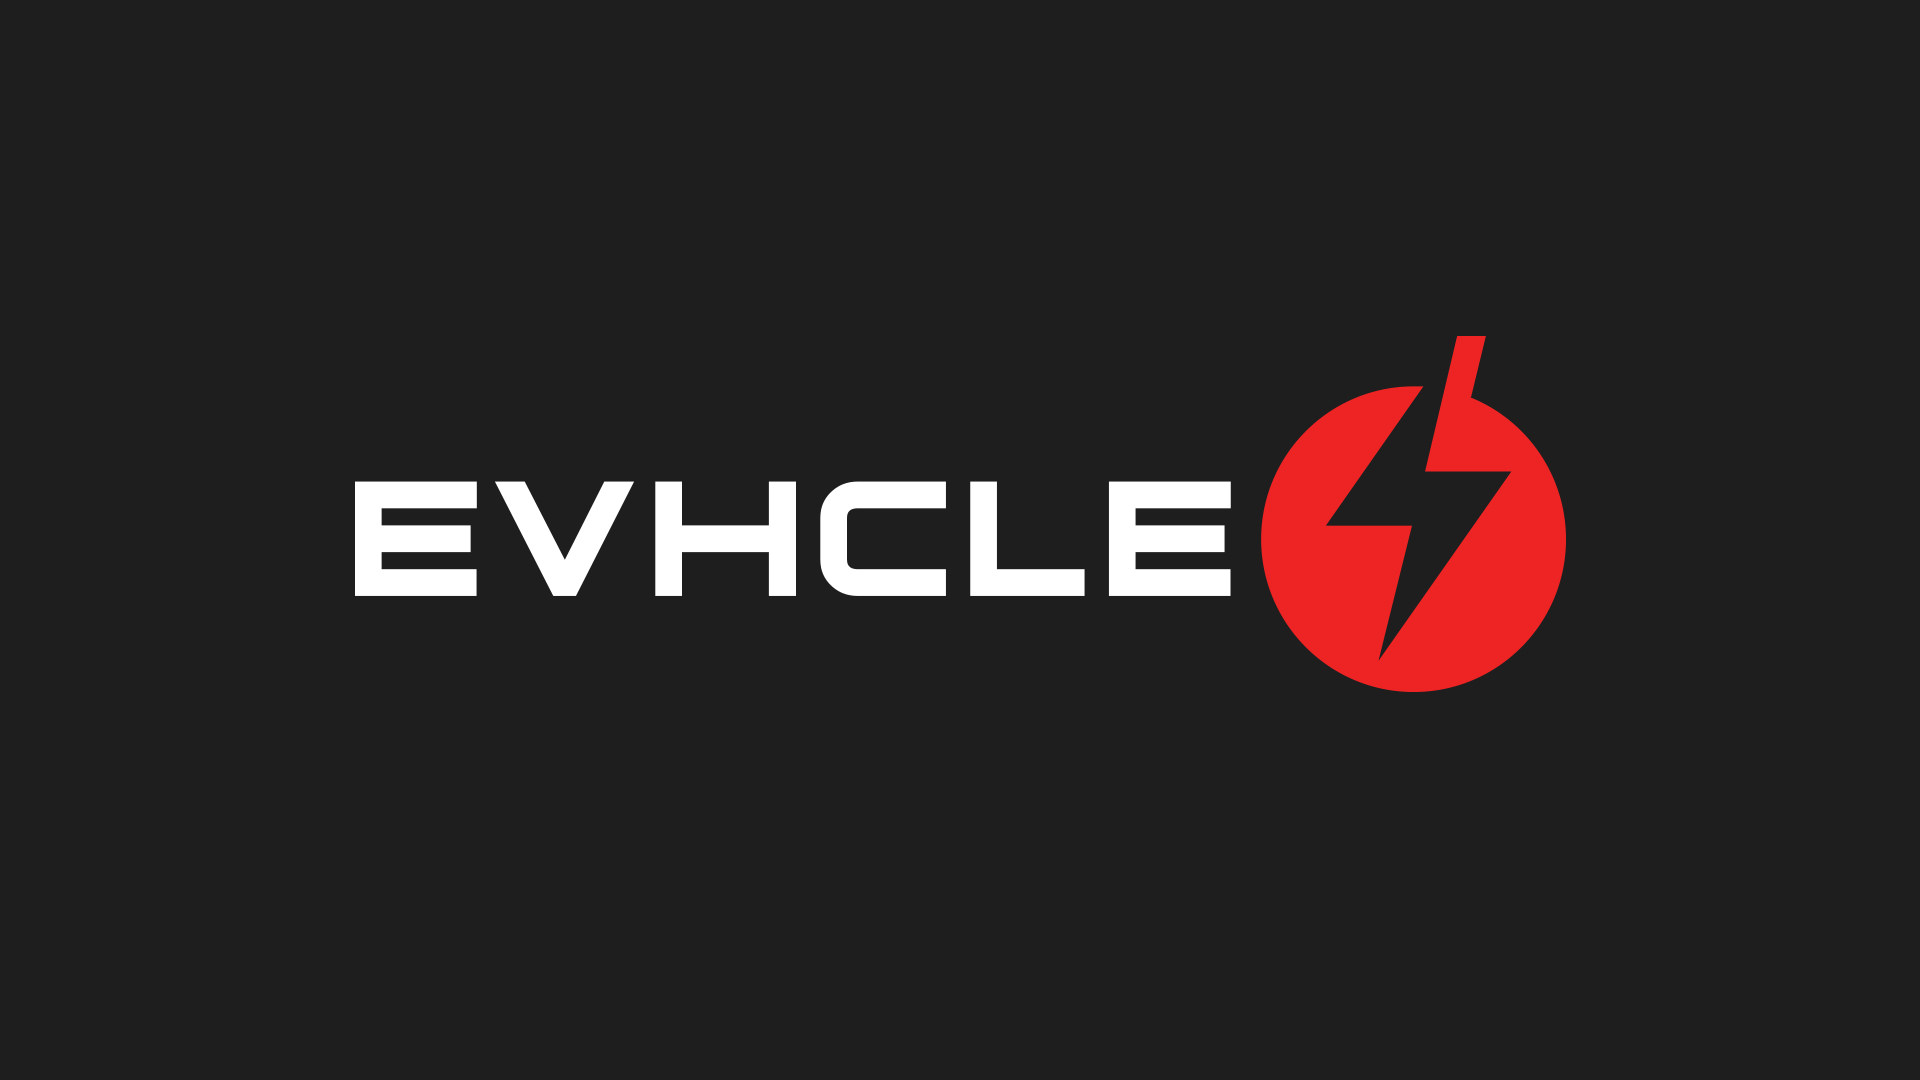 evhcle01